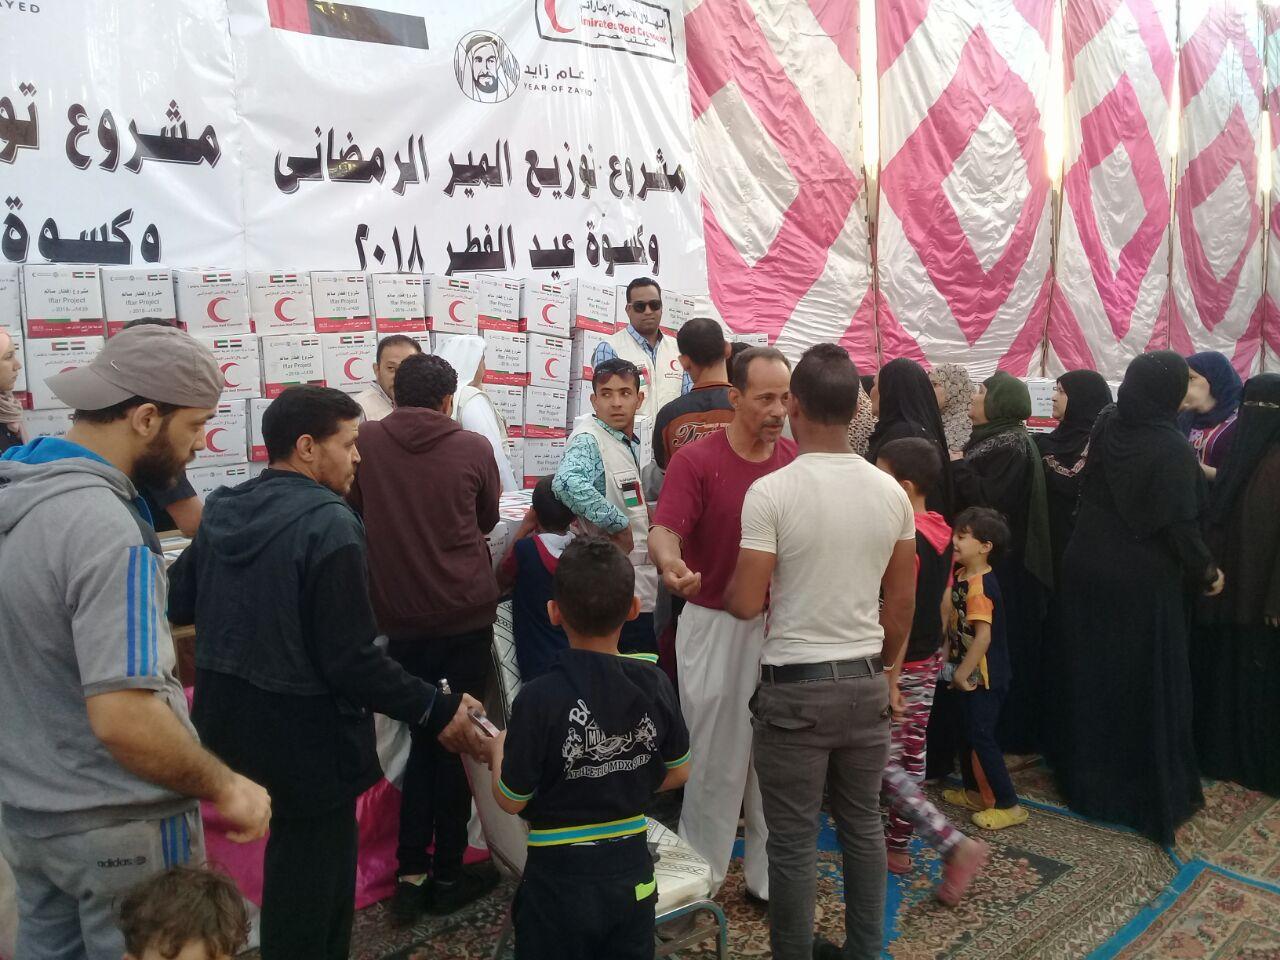 توزيع كرتونة رمضان  (7)